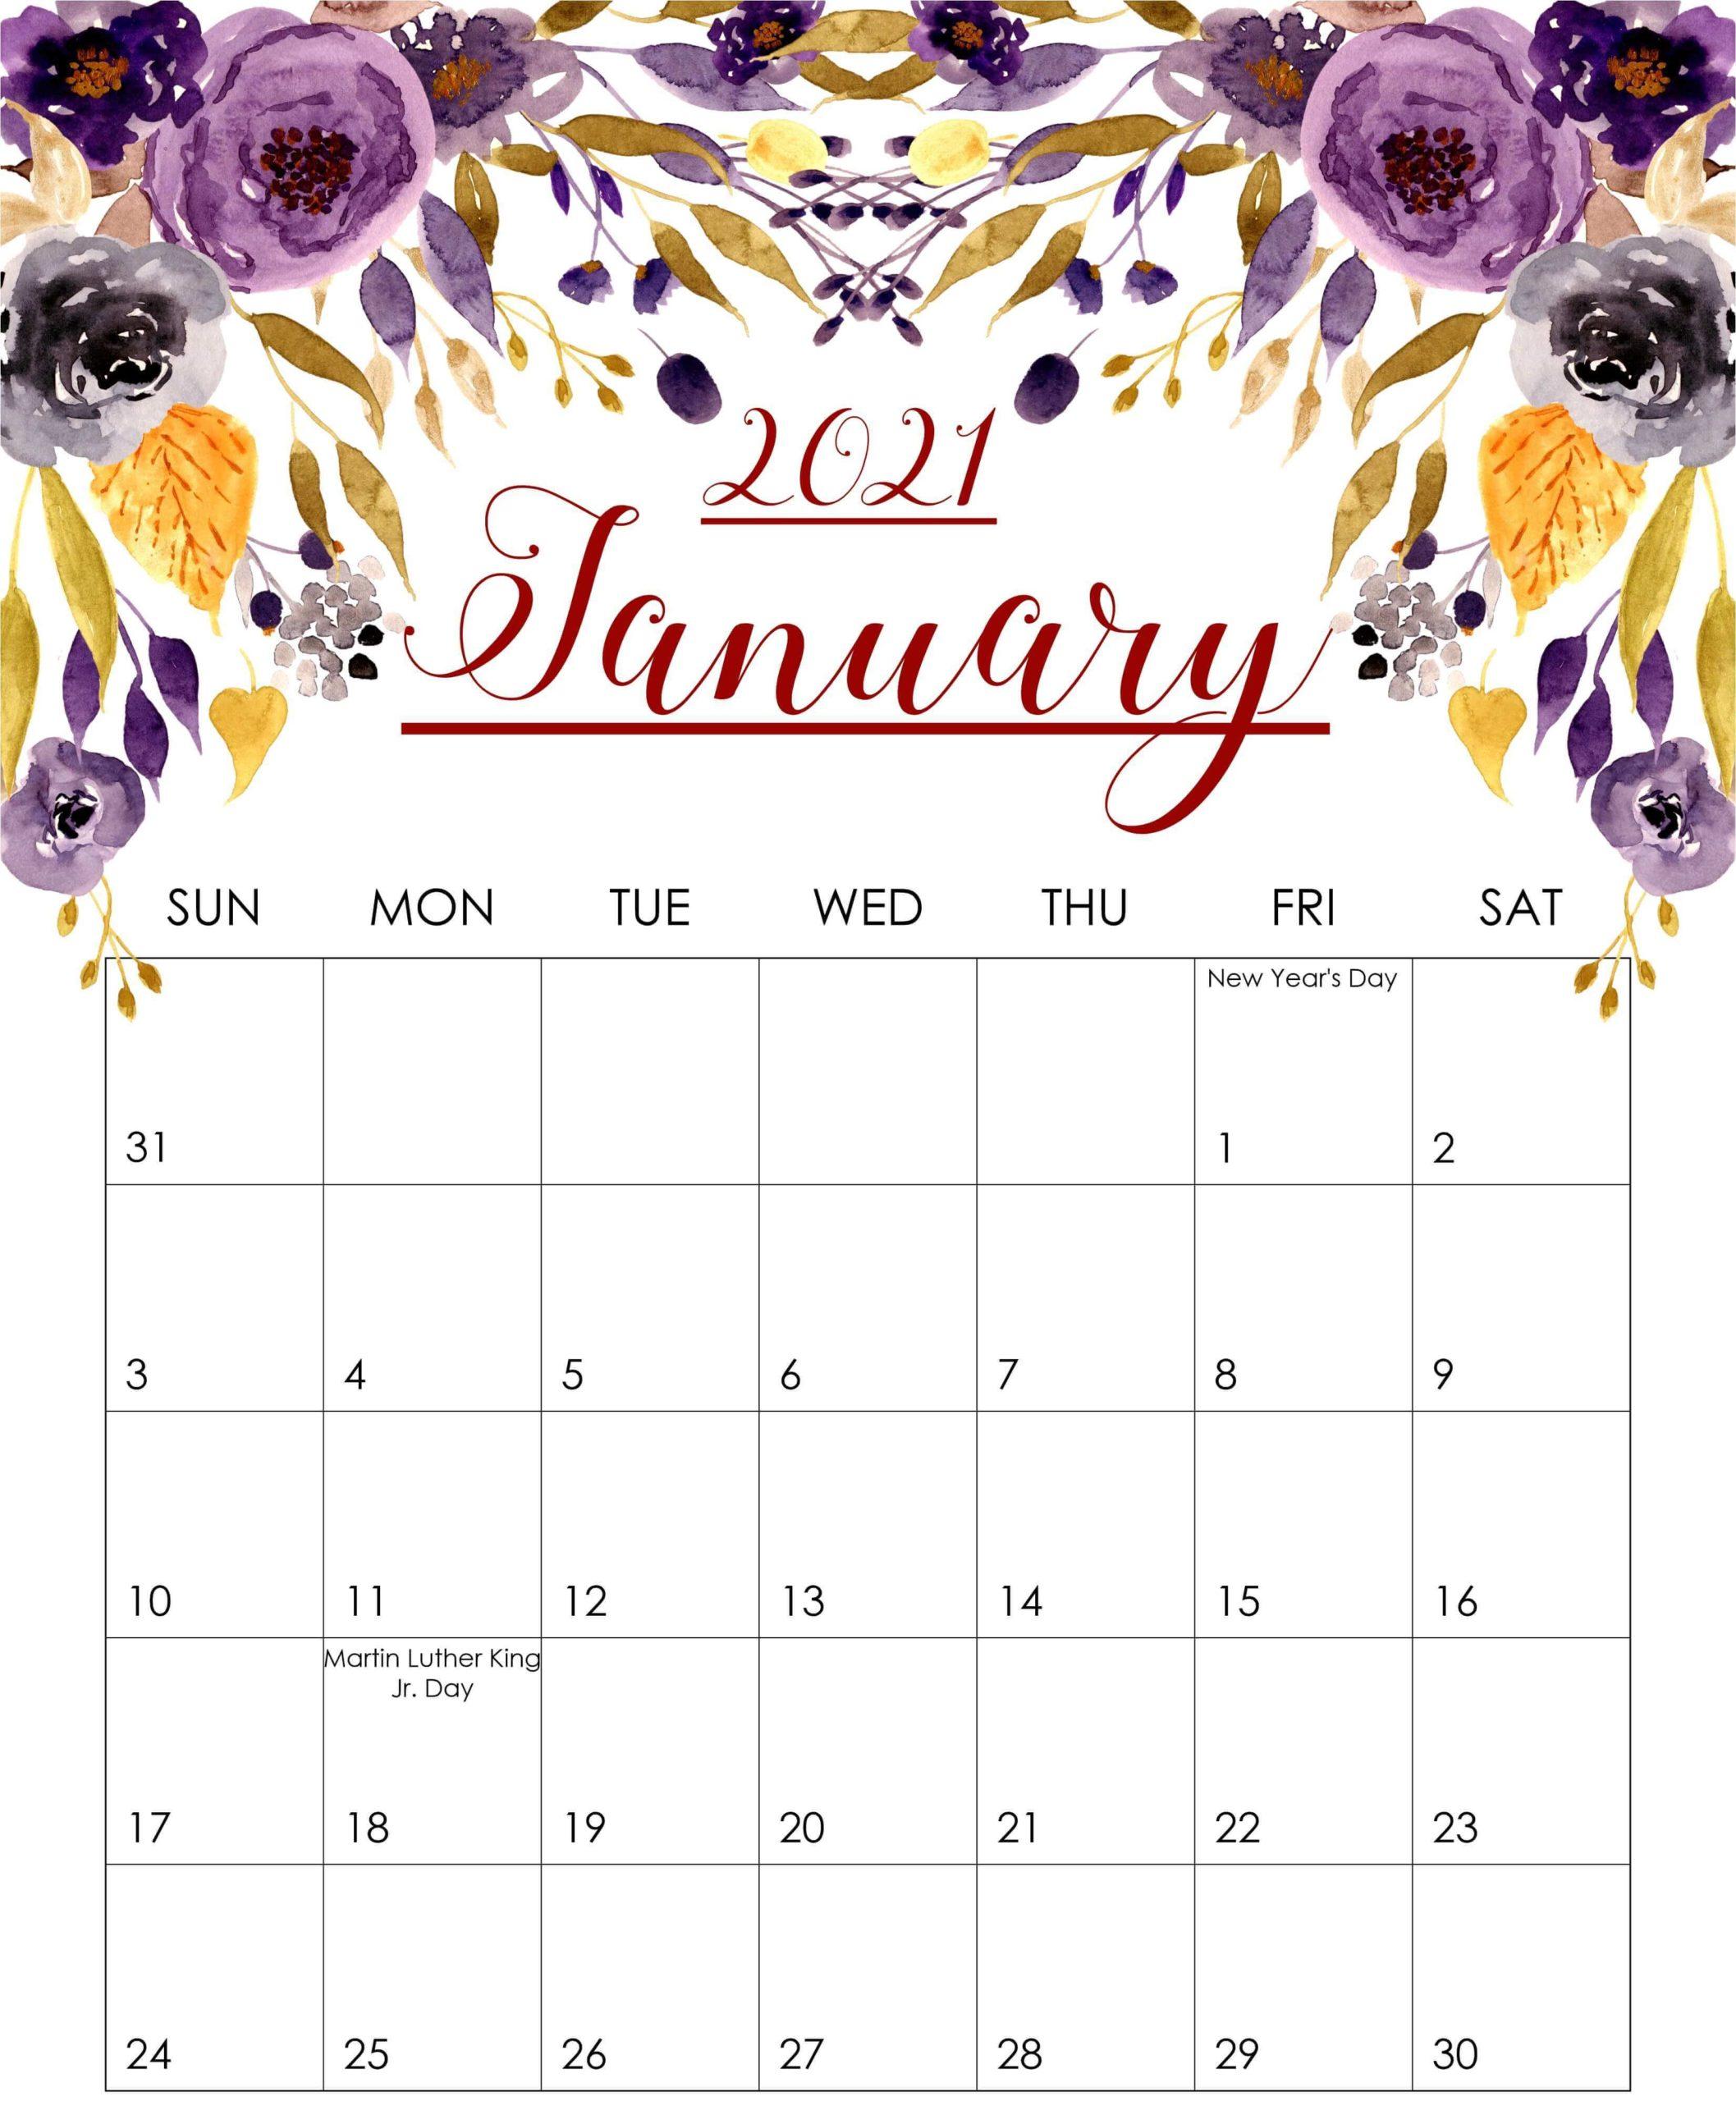 Floral January 2021 Calendar